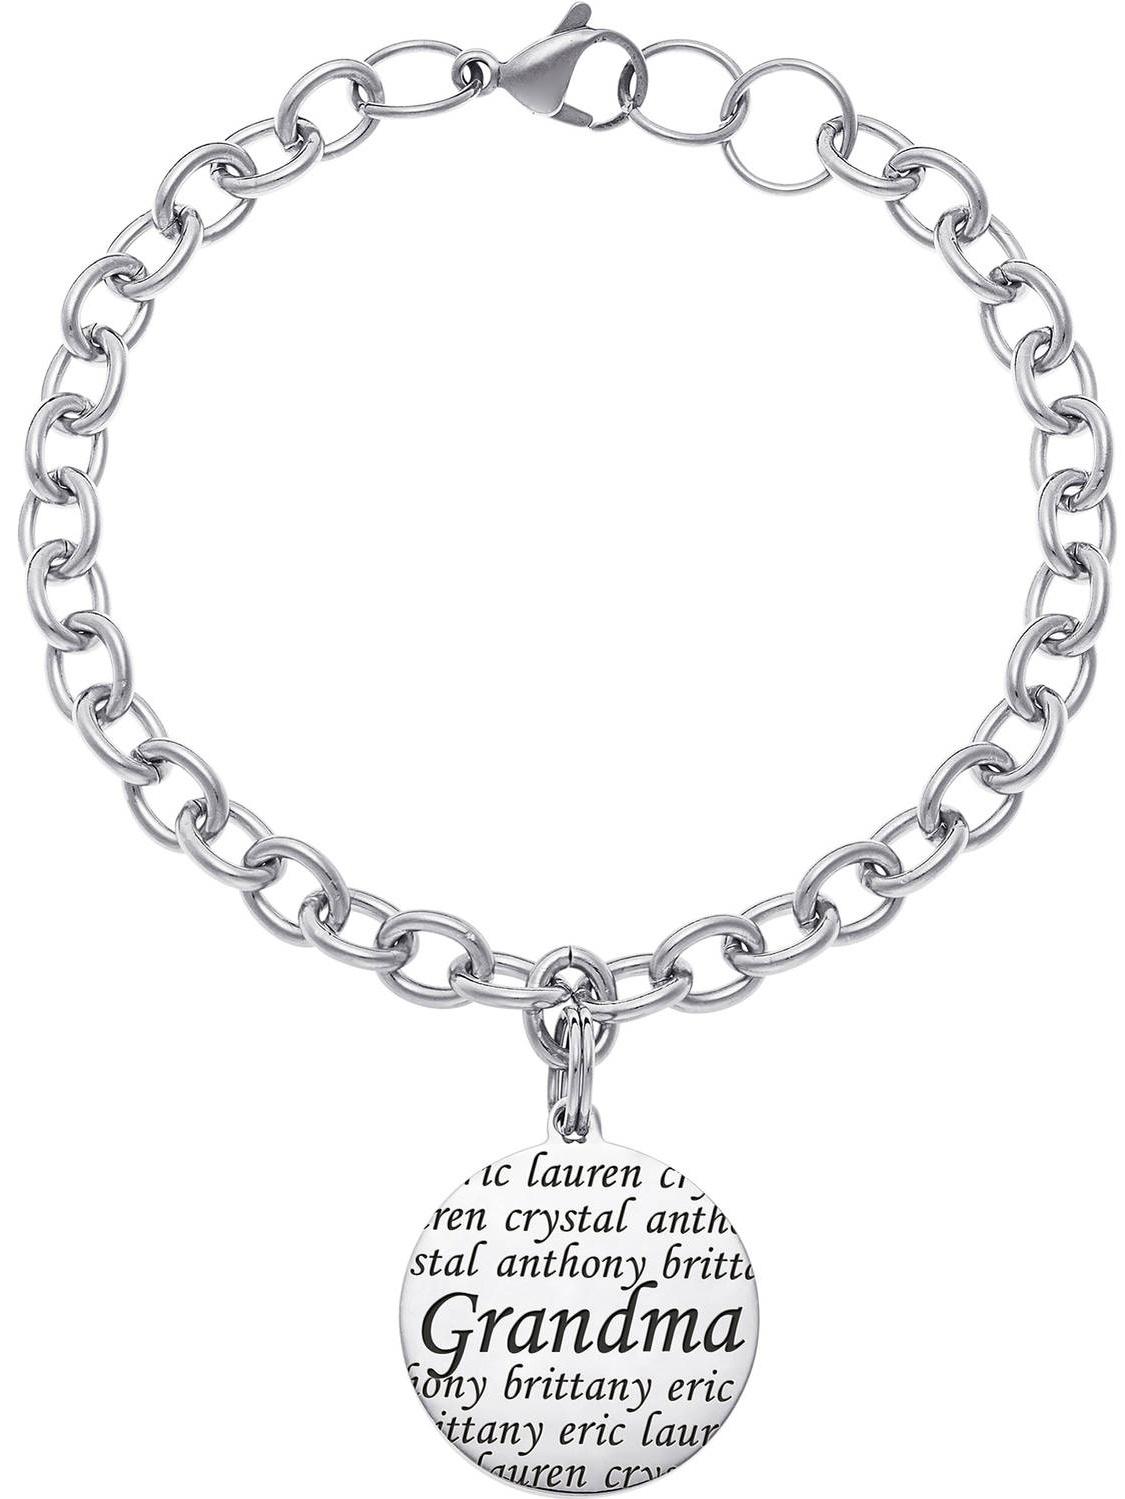 Personalized Everscribe Grandma Stainless Steel Name Bracelet